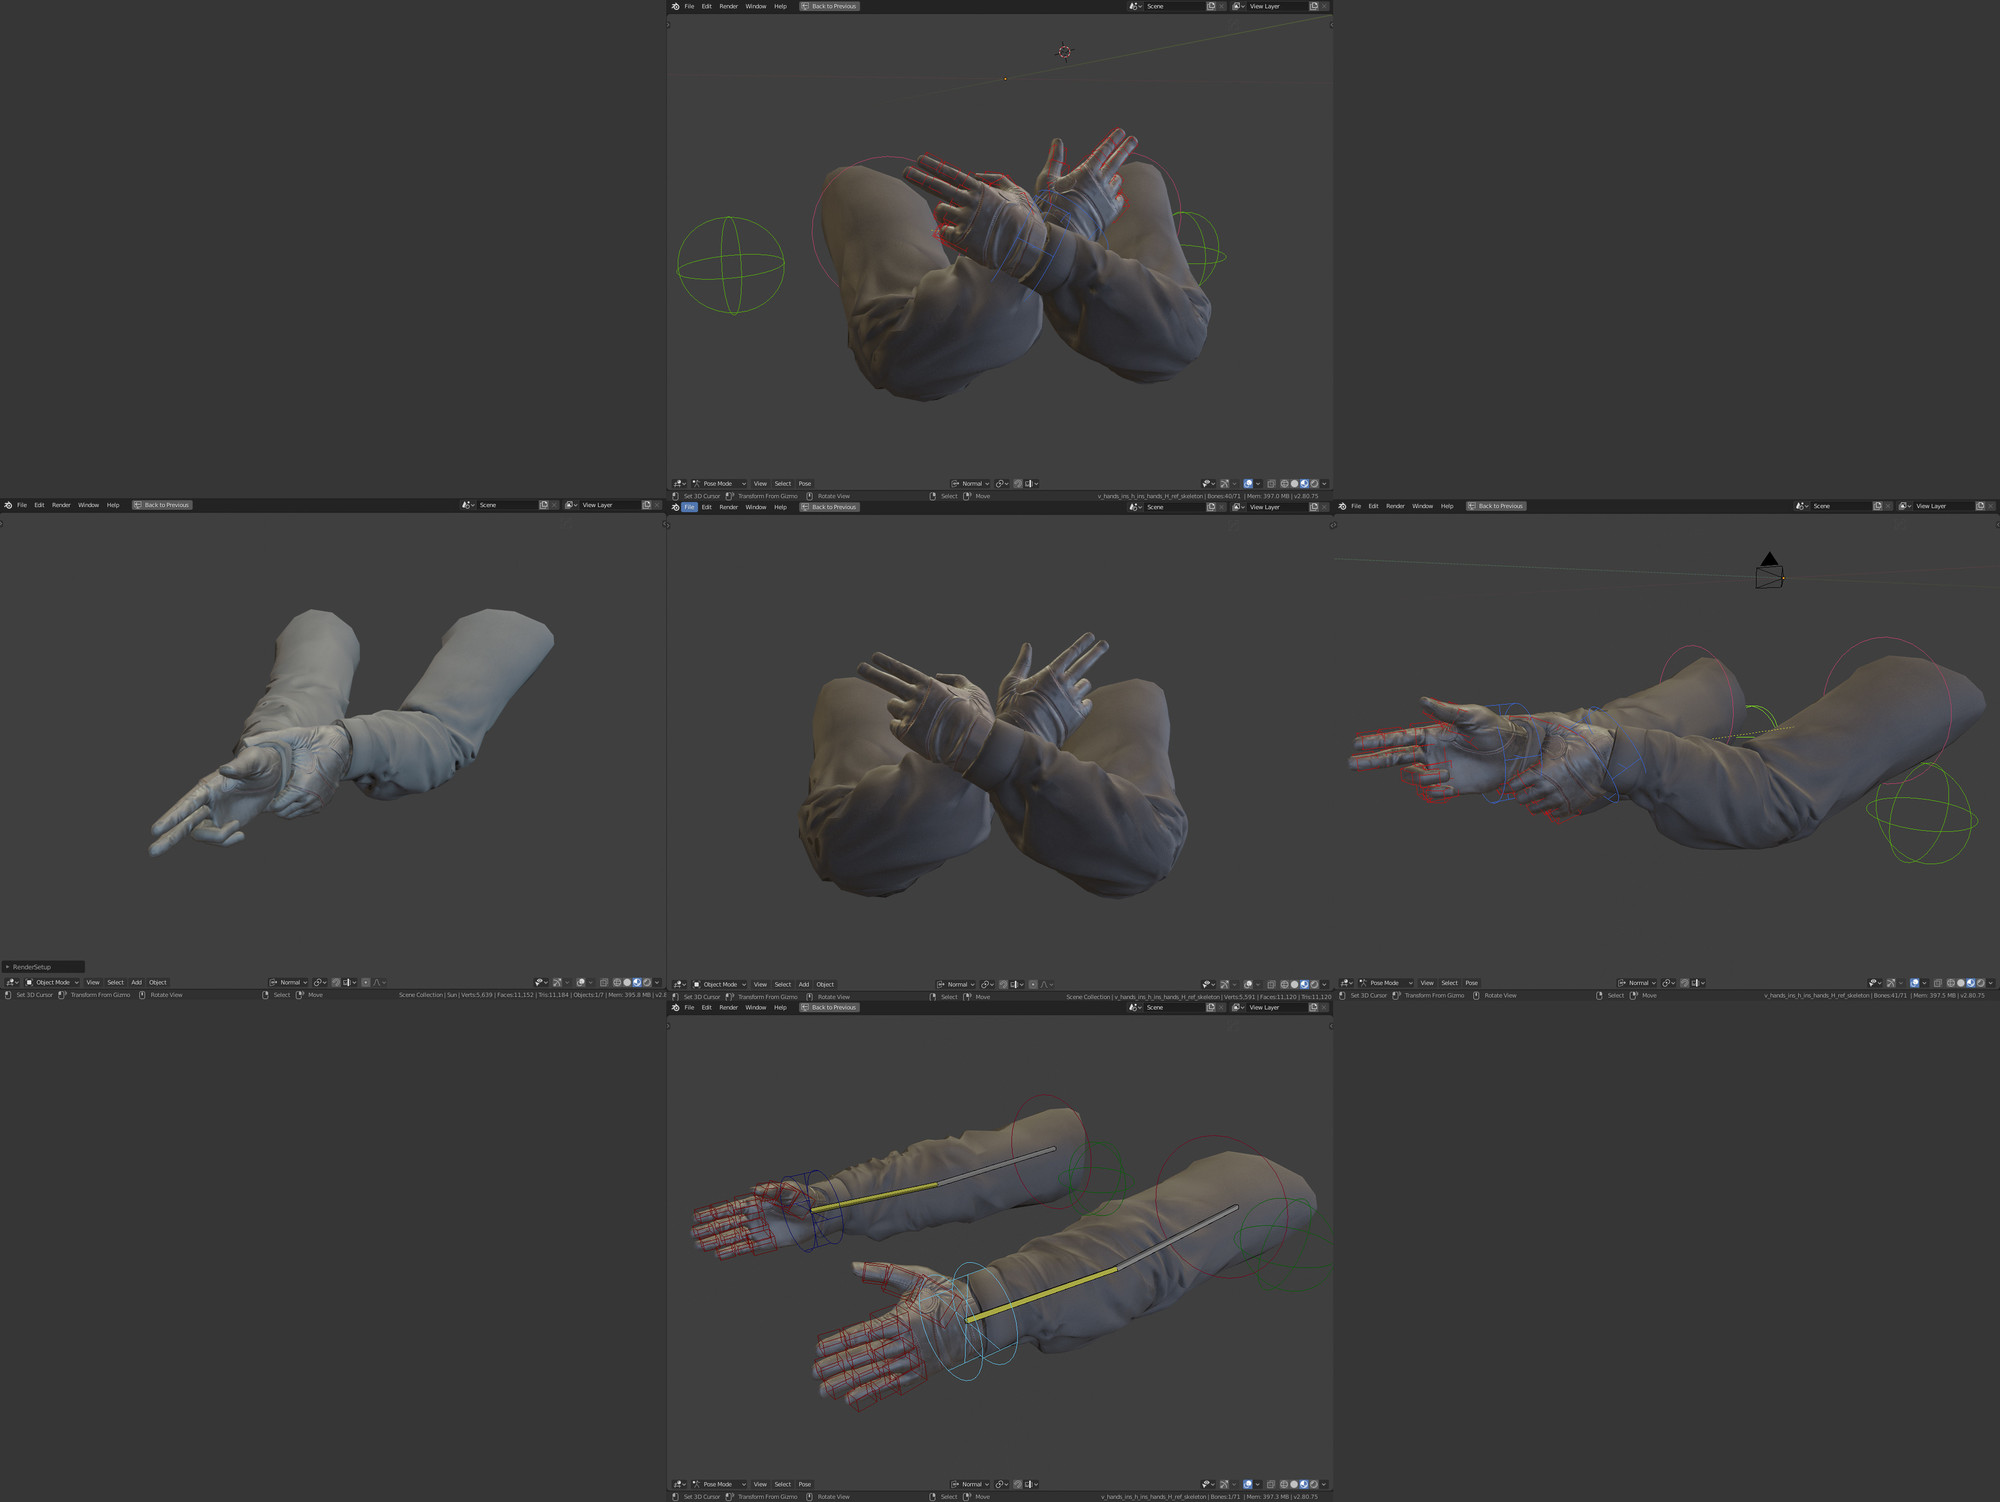 handz00.thumb.jpg.0657a3c524bd5f9a987f9d9717d06410.jpg